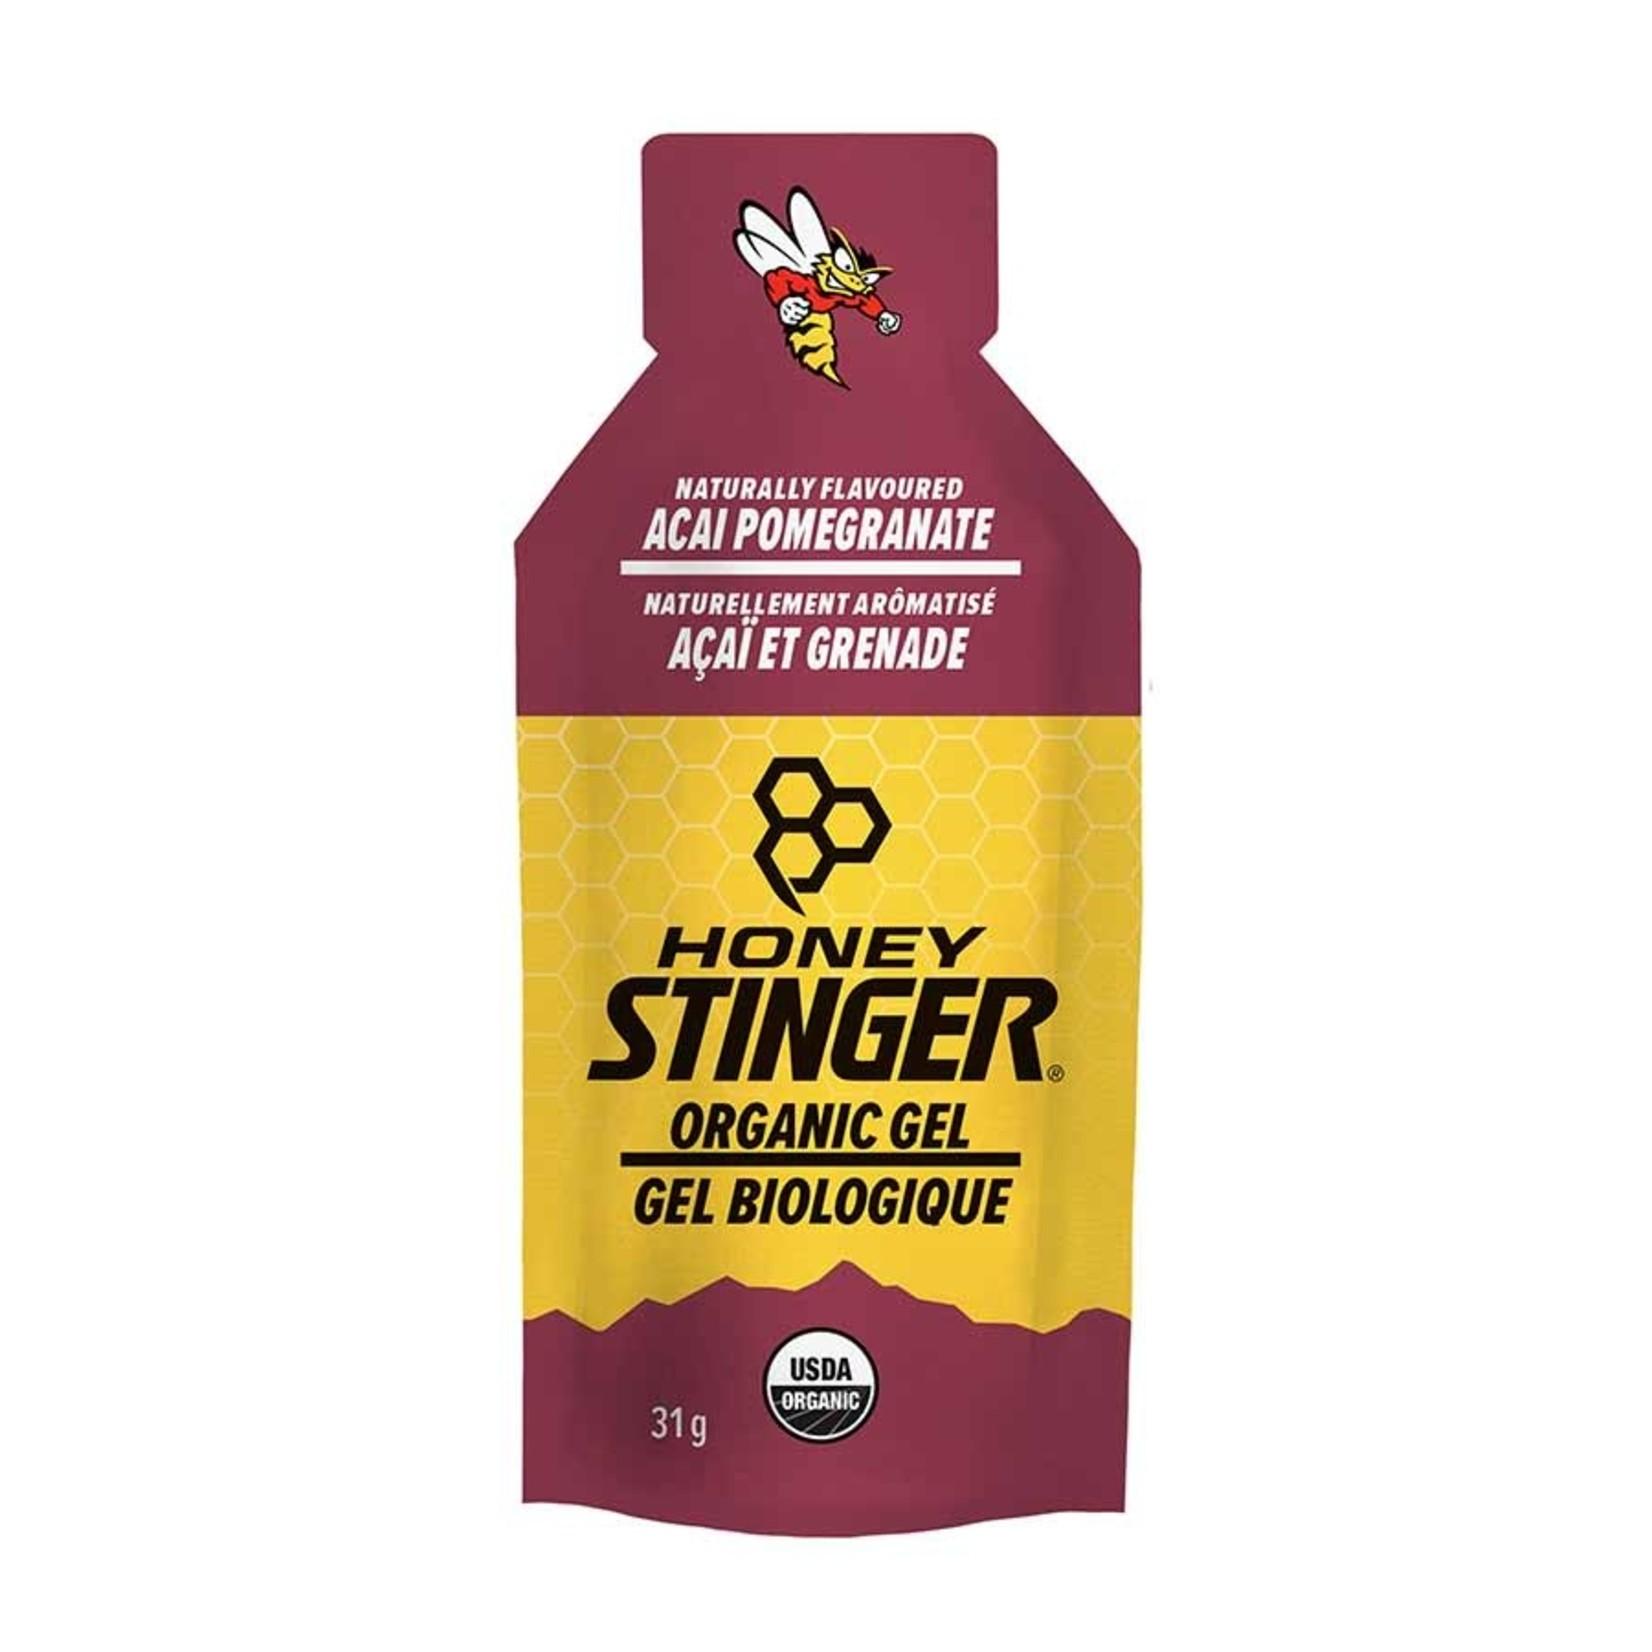 Honey Stinger Honey Stinger Acai Pomegranate Gels